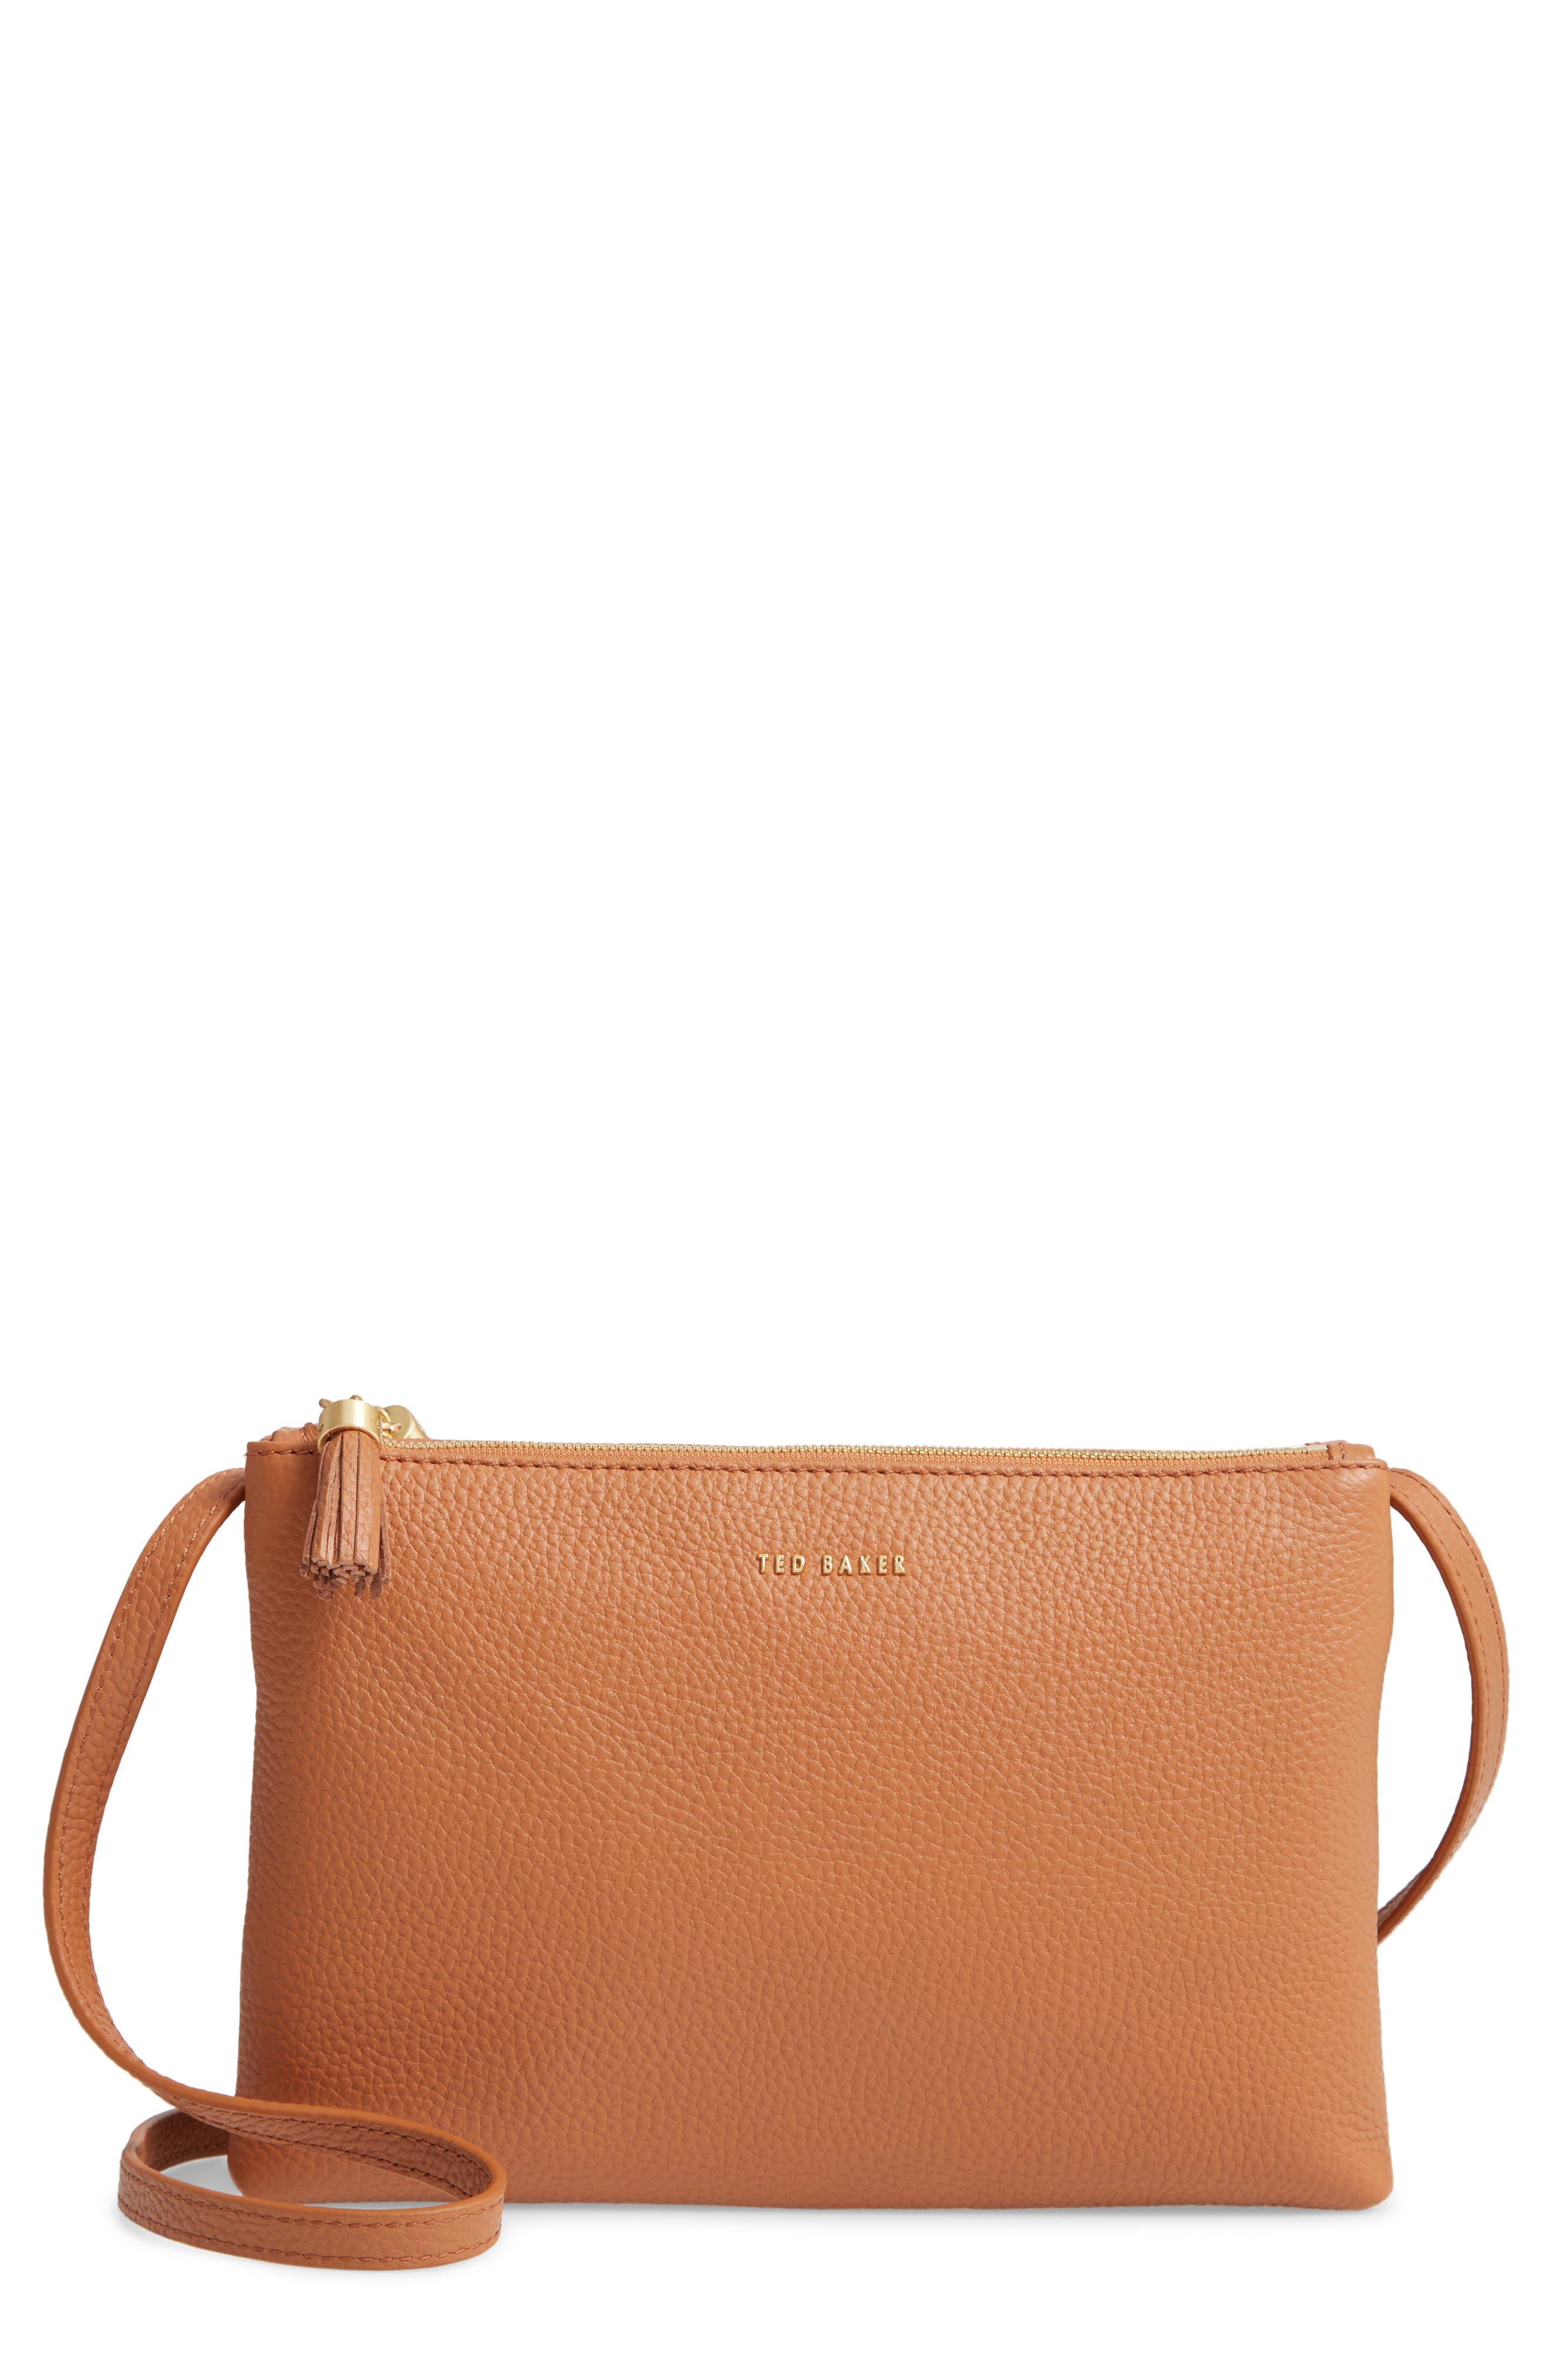 47aec7342b Ted Baker London Handbags & Wallets for Women | Nordstrom